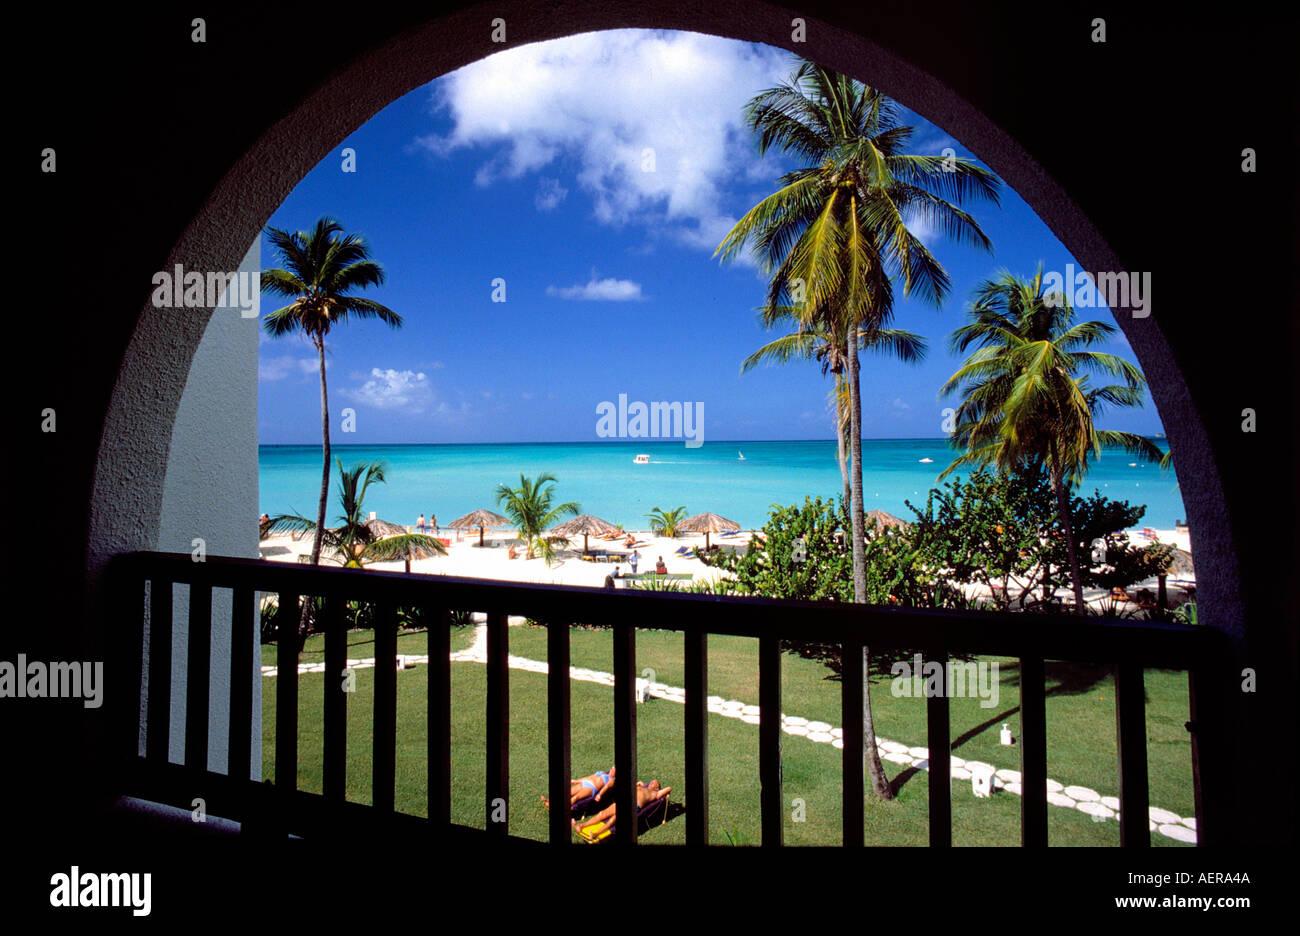 hotel jolly beach island of antigua archipelago of the lesser antilles caribbean - Stock Image